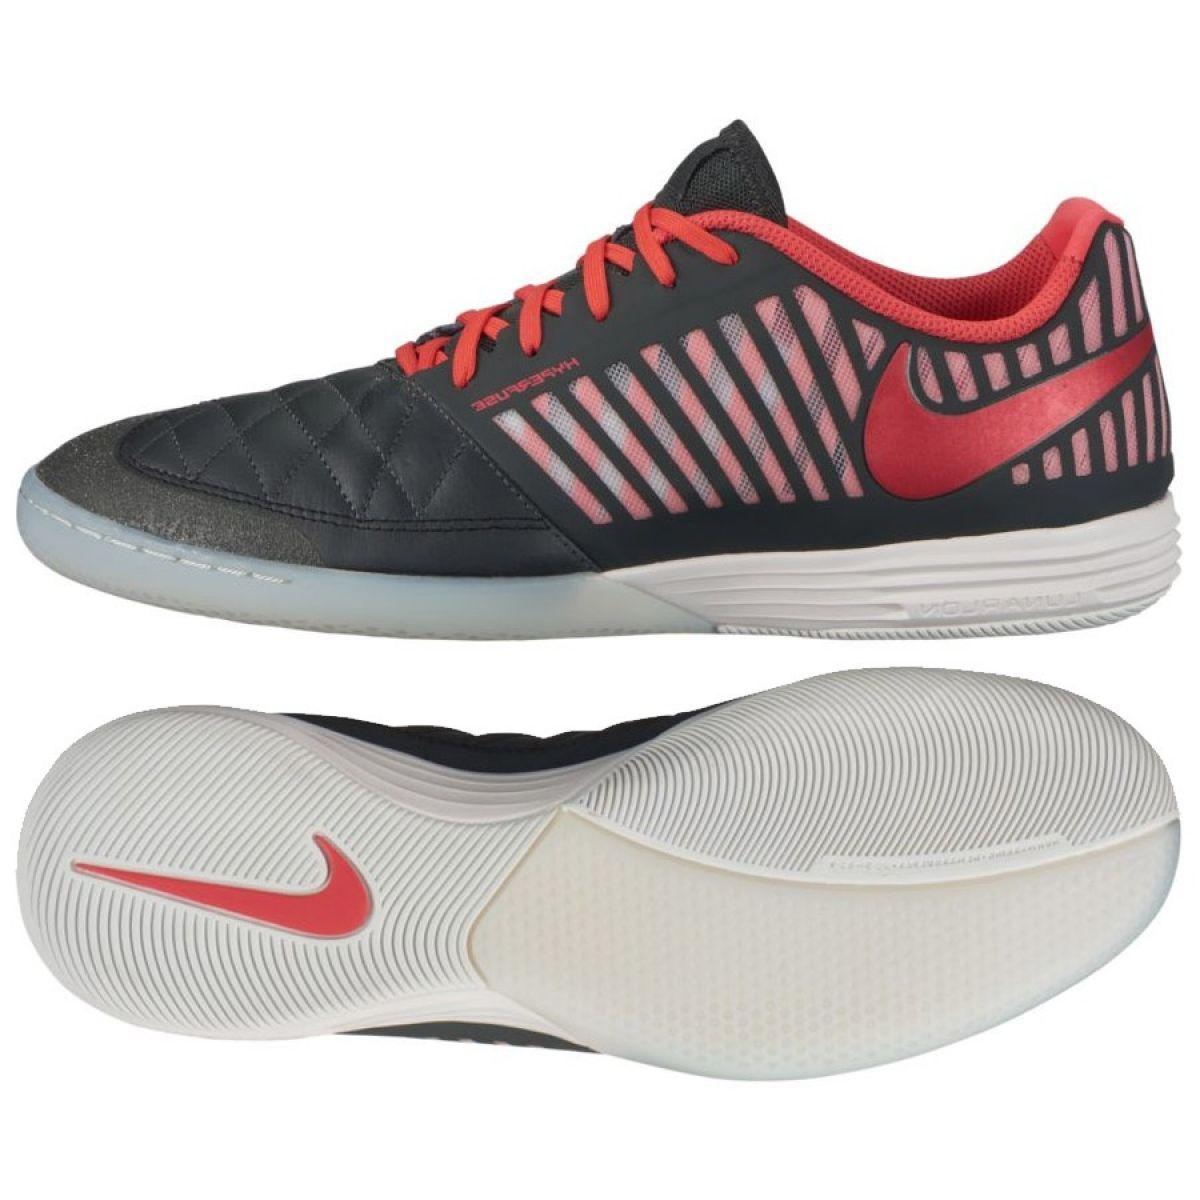 Ic Chaussures Nike 080 Ii 580456 D'intérieur M Lunargato uXiOPZk